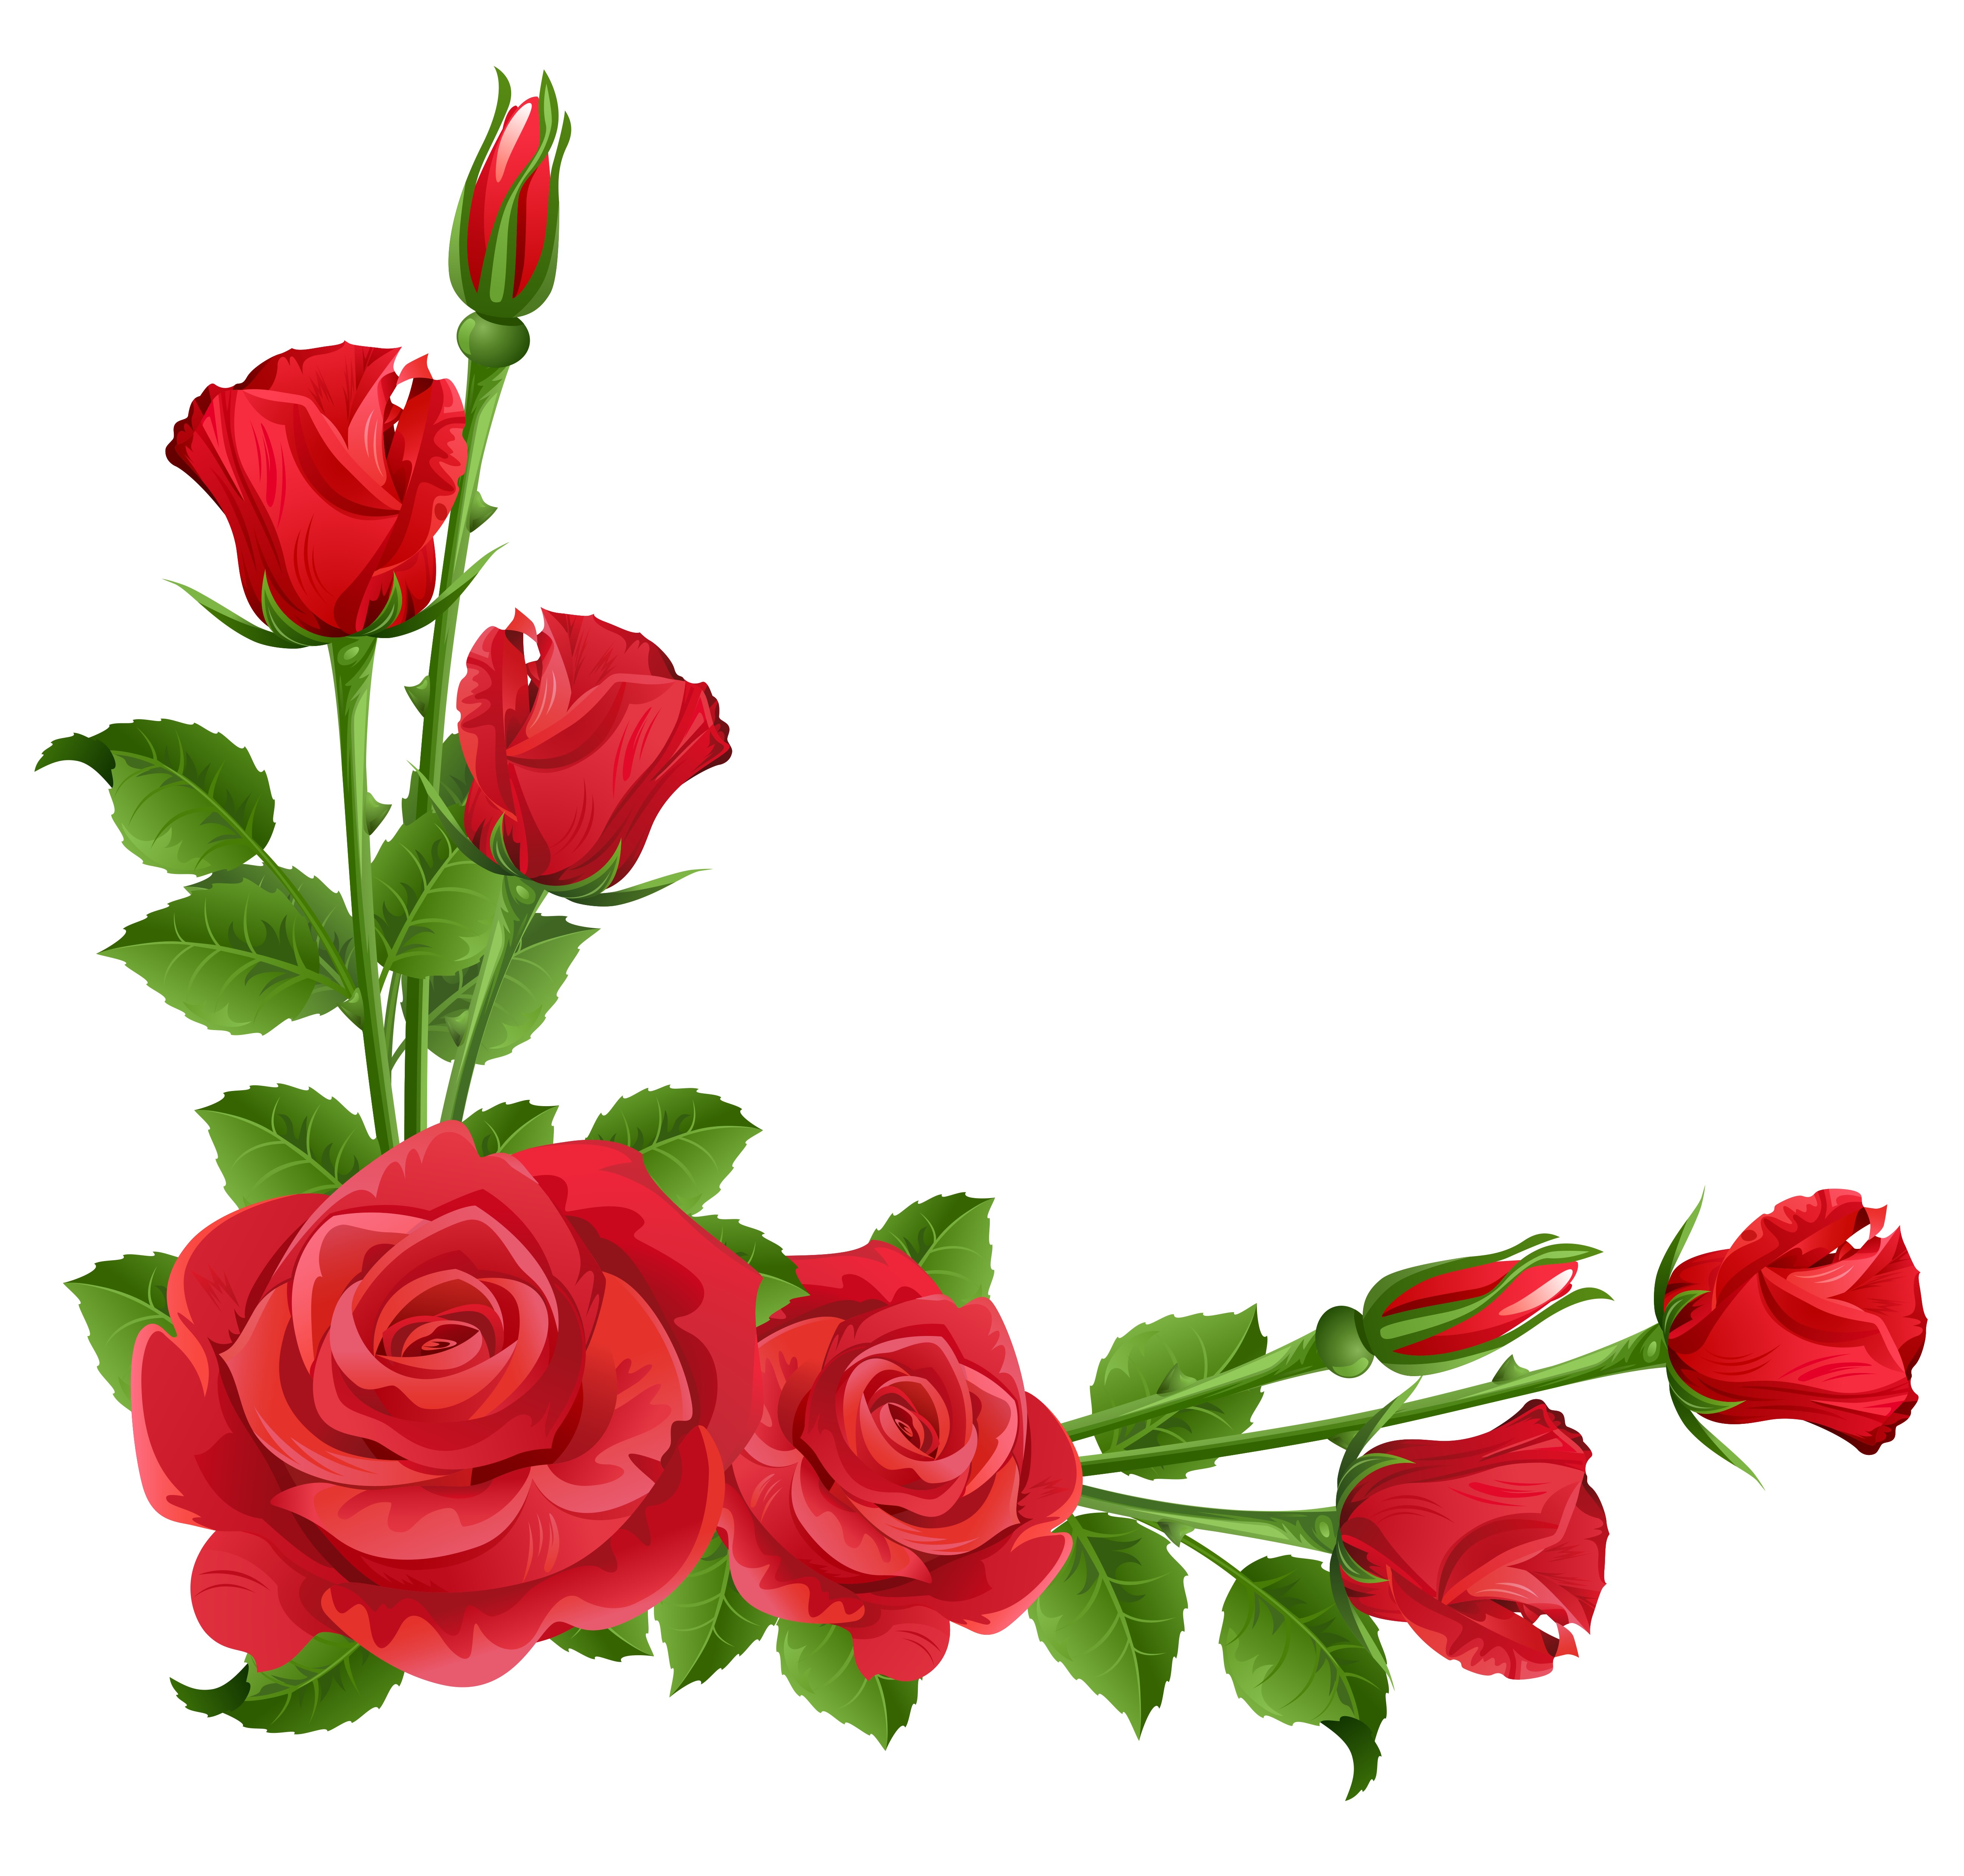 Circle clipart rose. Red roses transparent png